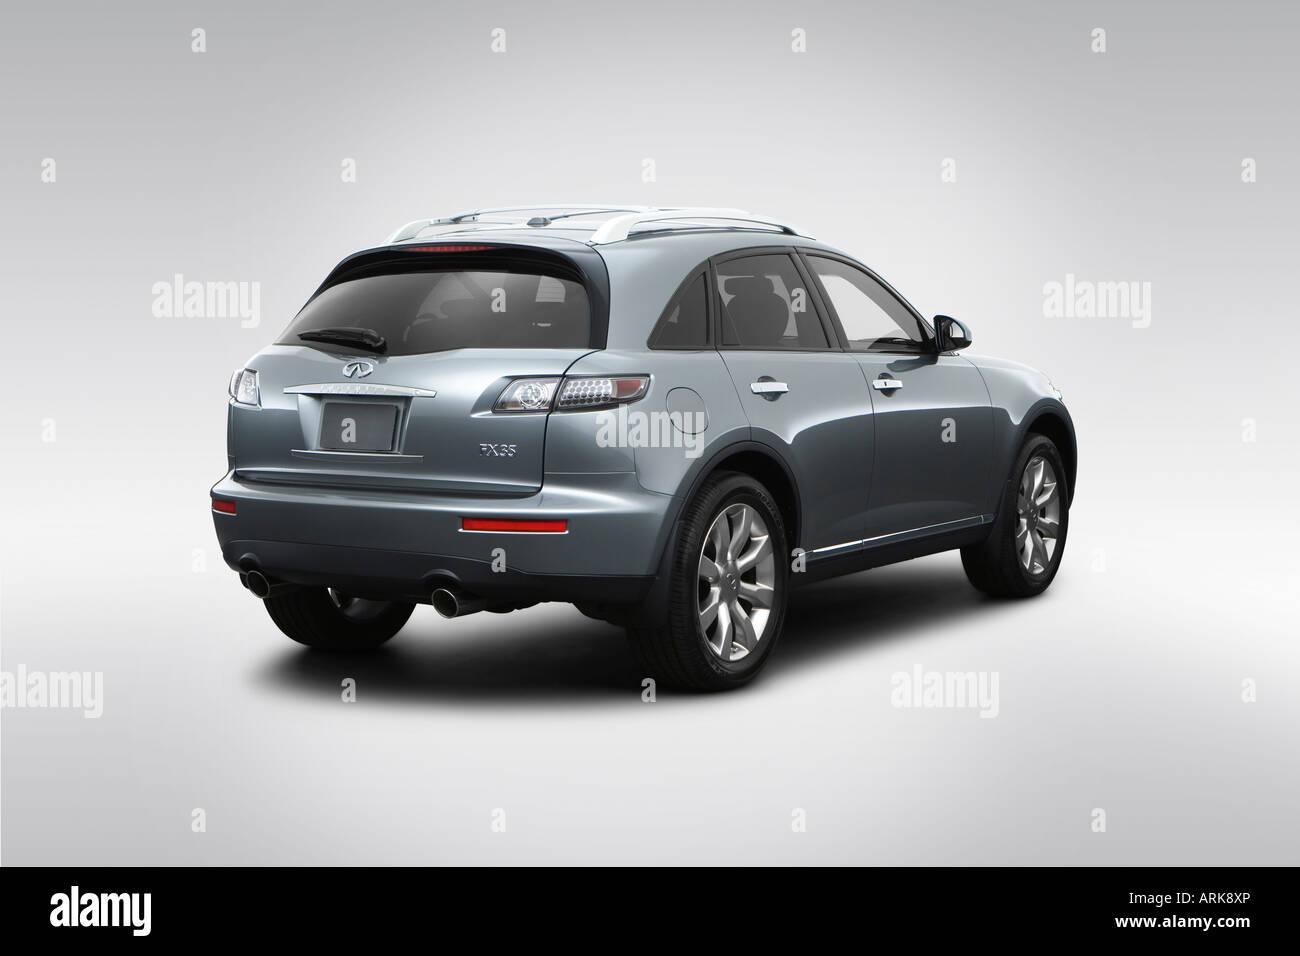 cars awd fx auto pkg saugus infinity usa infiniti navigation at house sport used